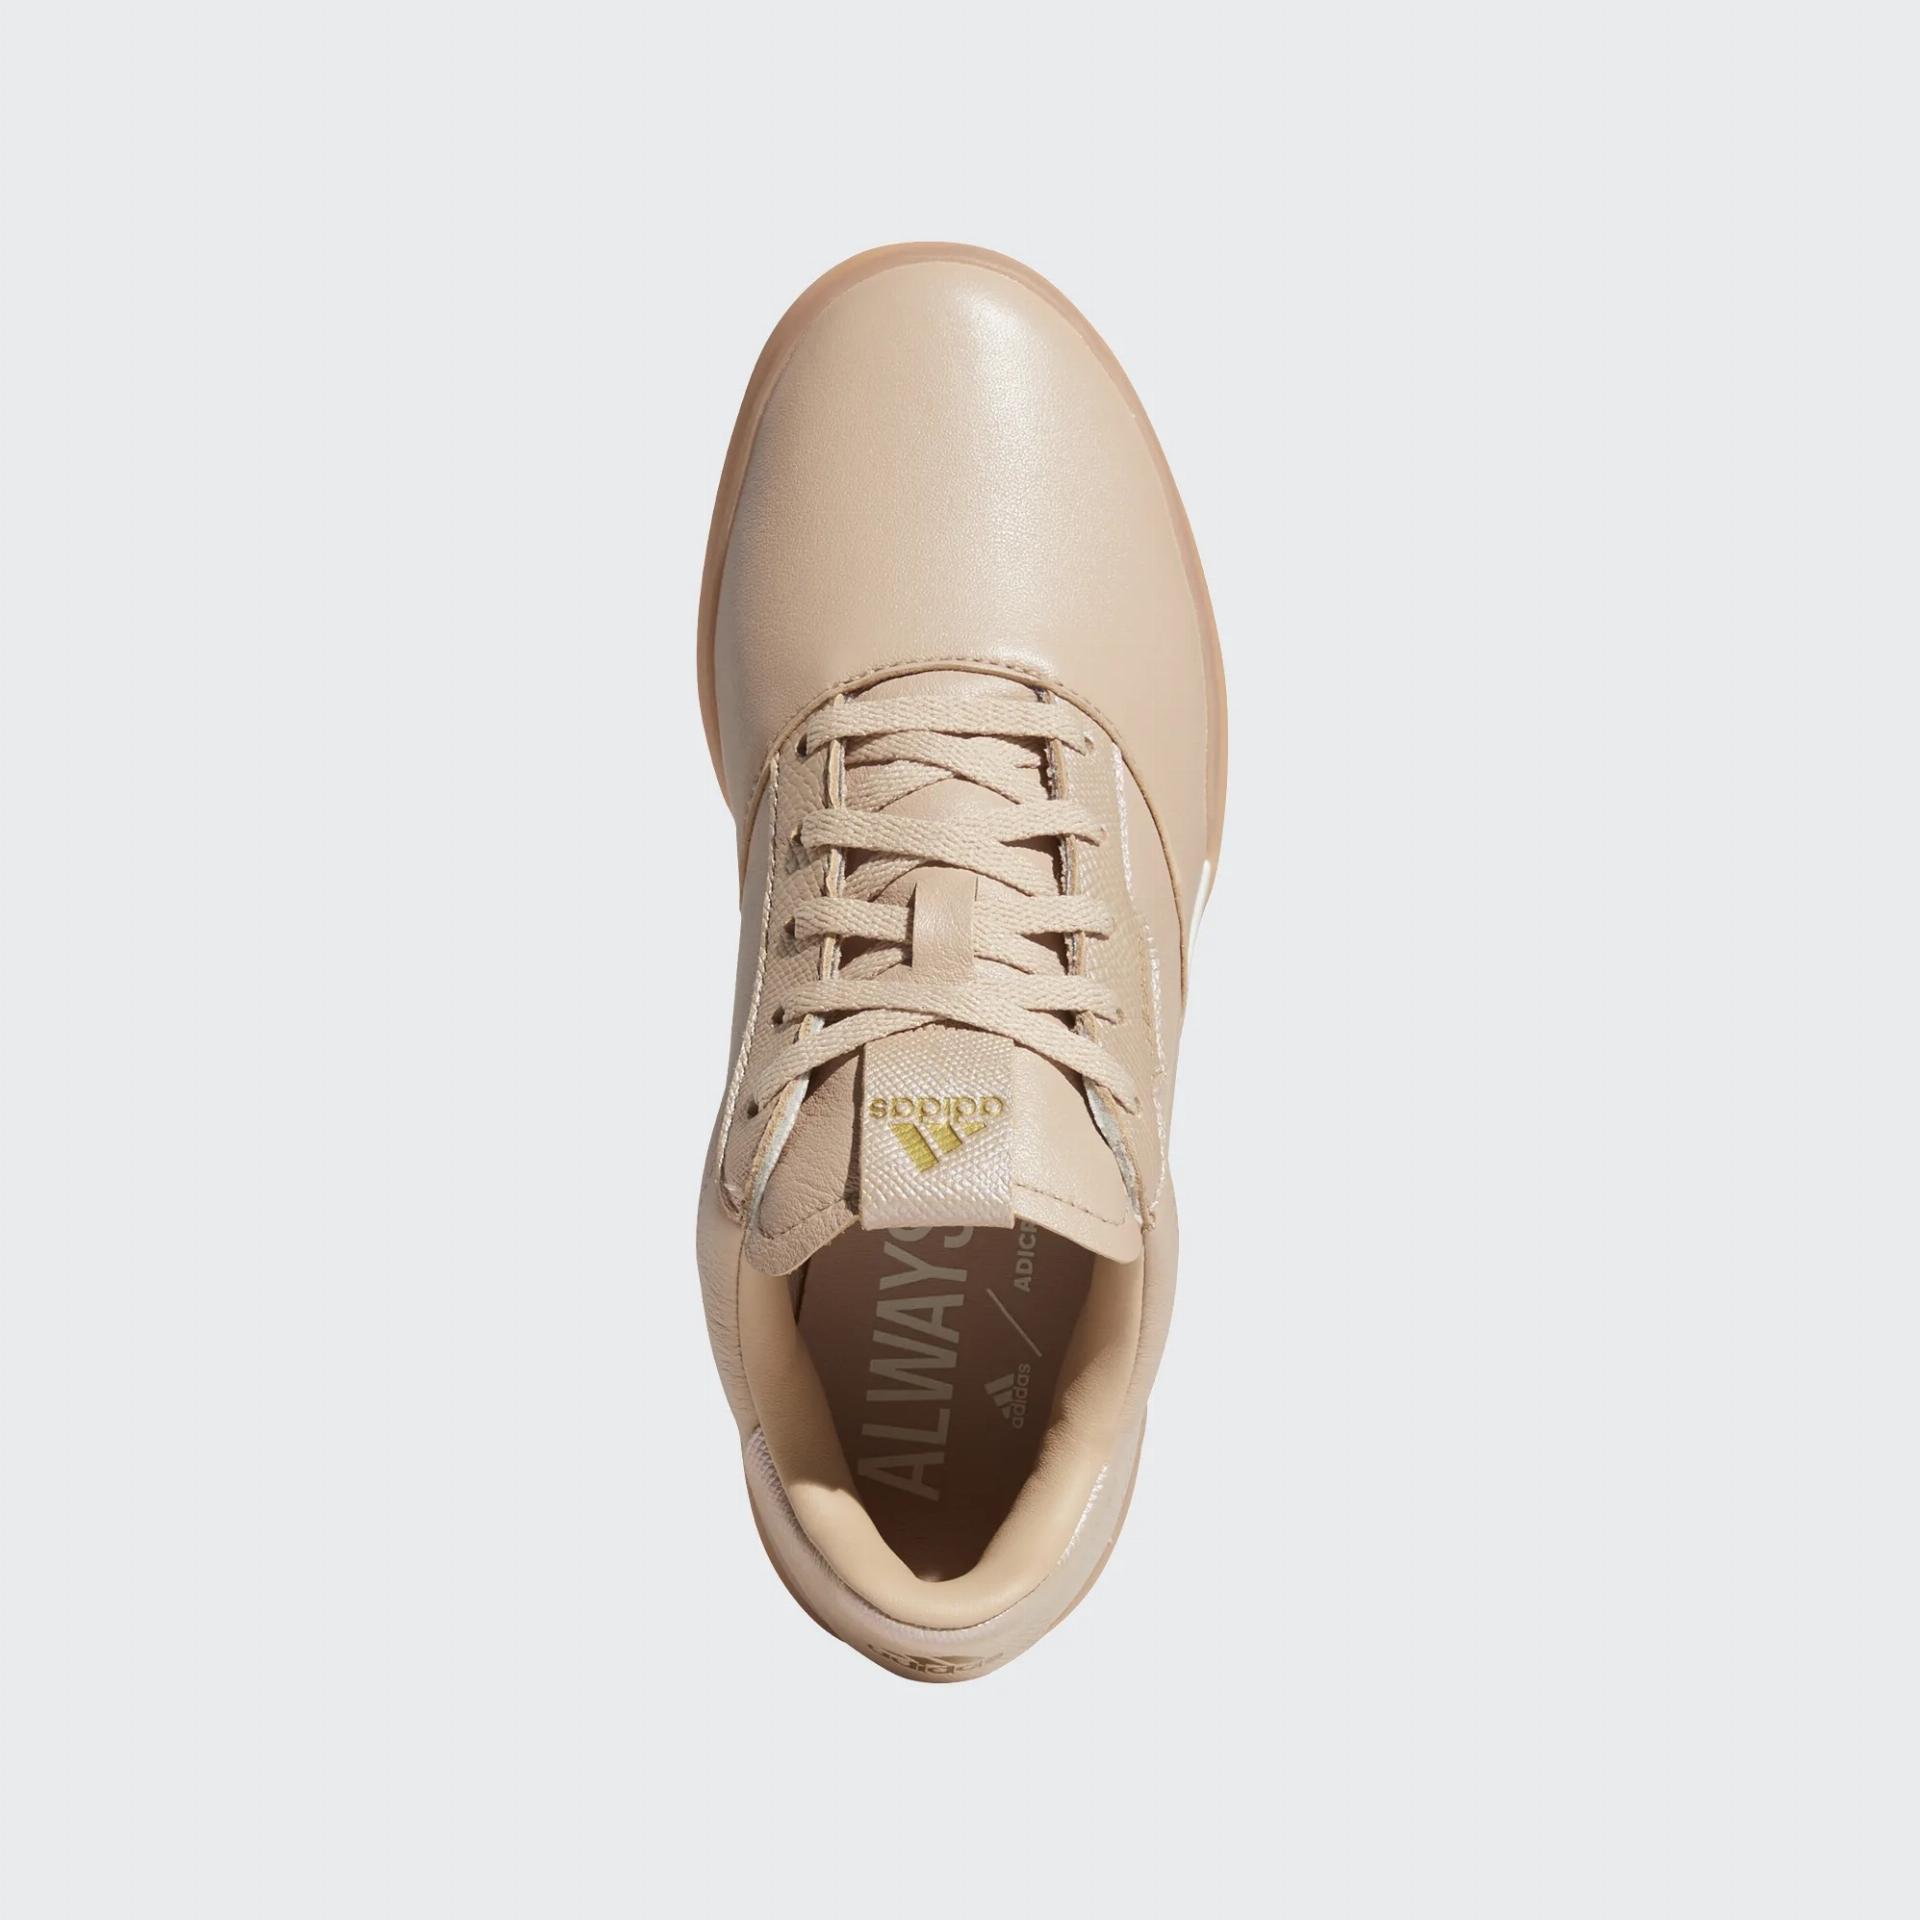 Adidas - ADICROSS RETRO - Rose